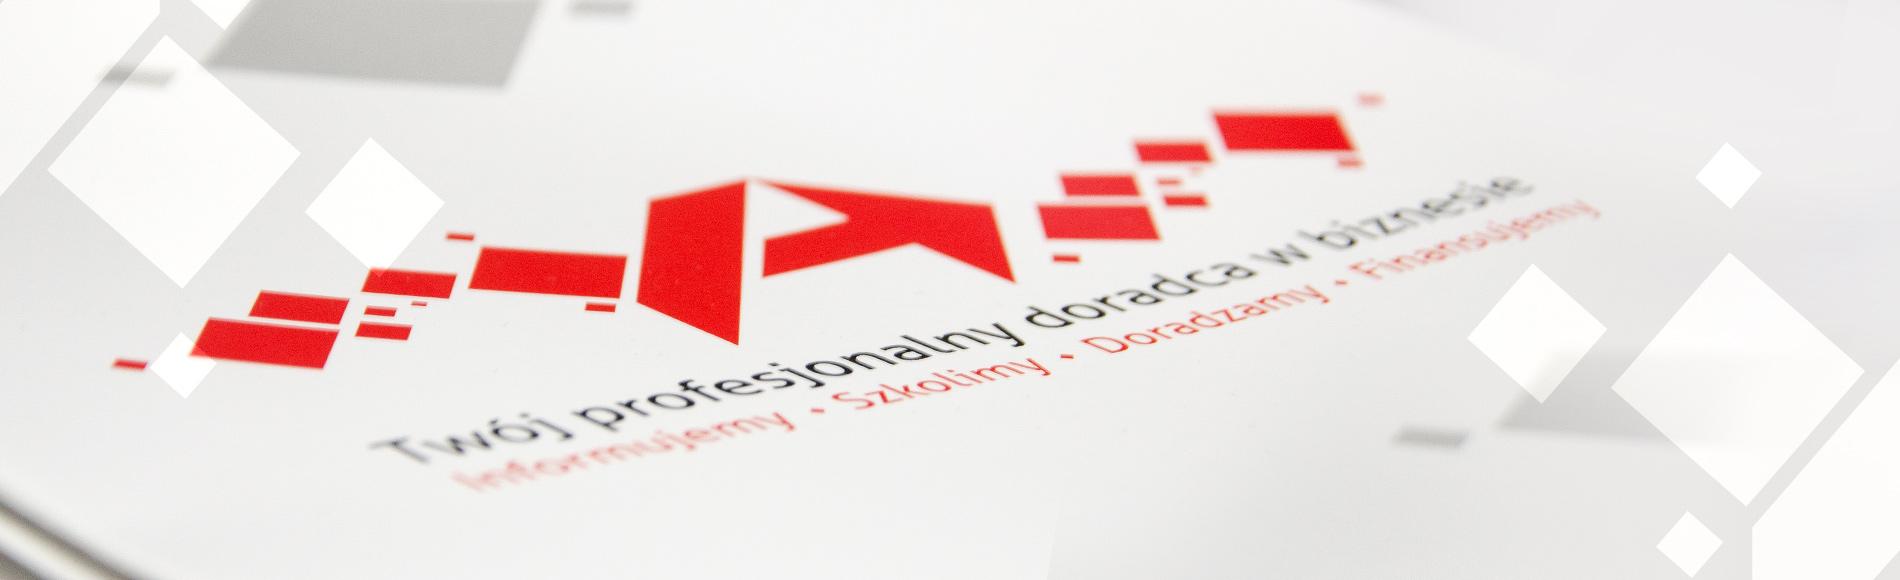 Arleg S.A. - sale konferencyjne i szkoleniowe Legnica